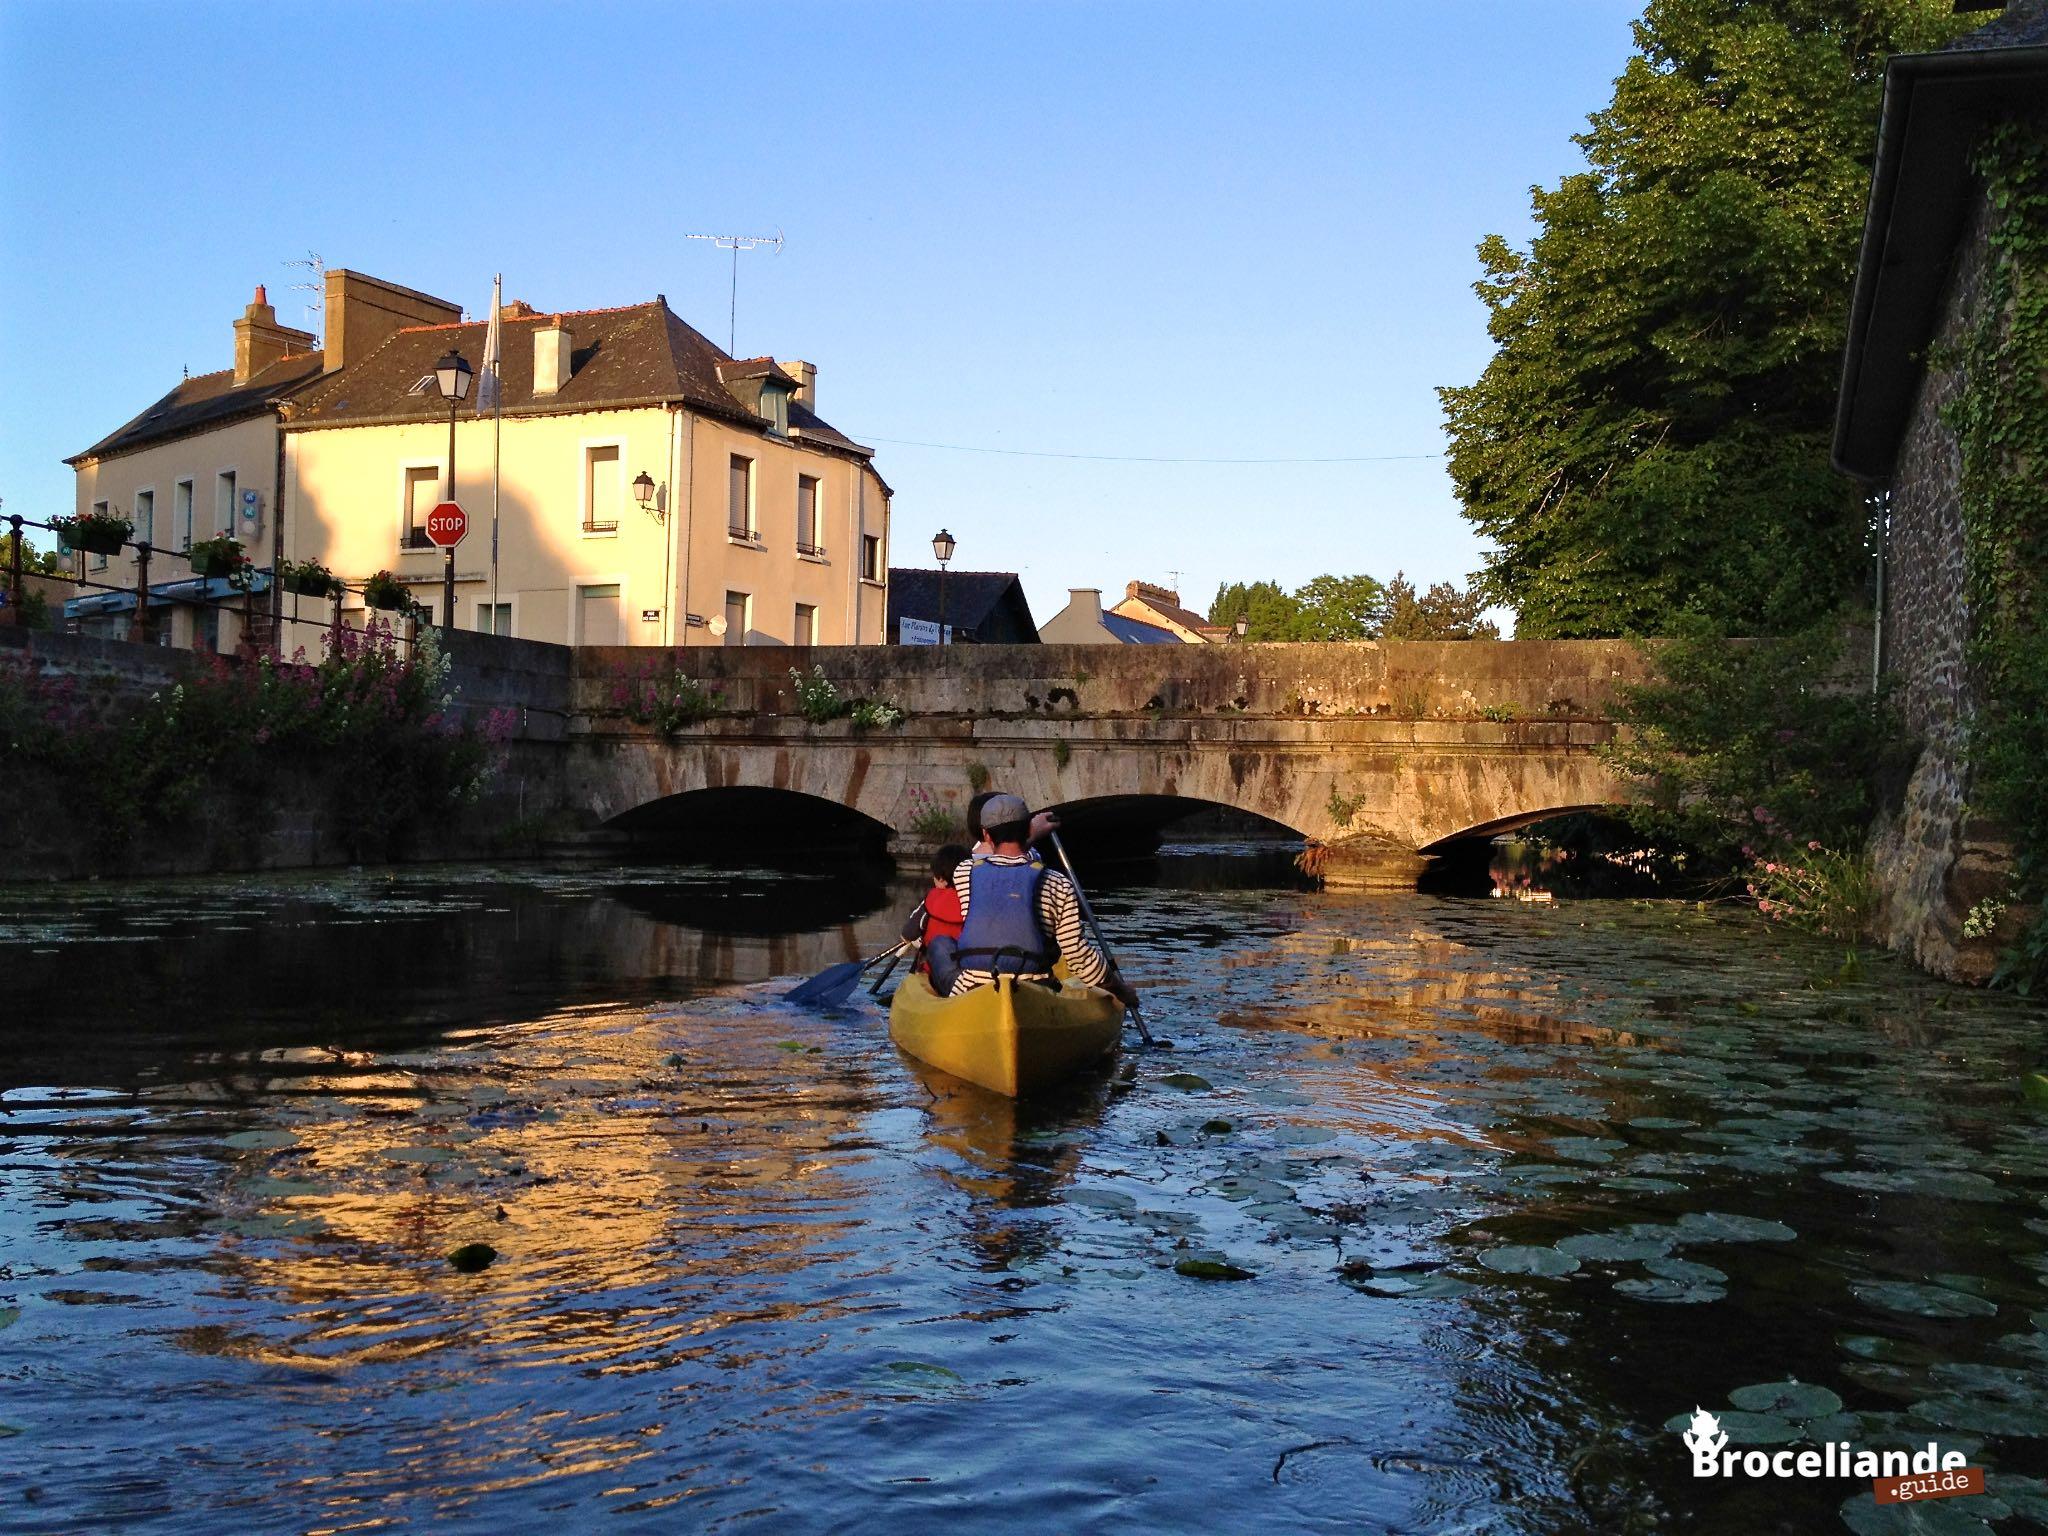 Montfort sur meu en cano kayak broc liande en bretagne for Piscine montfort sur meu